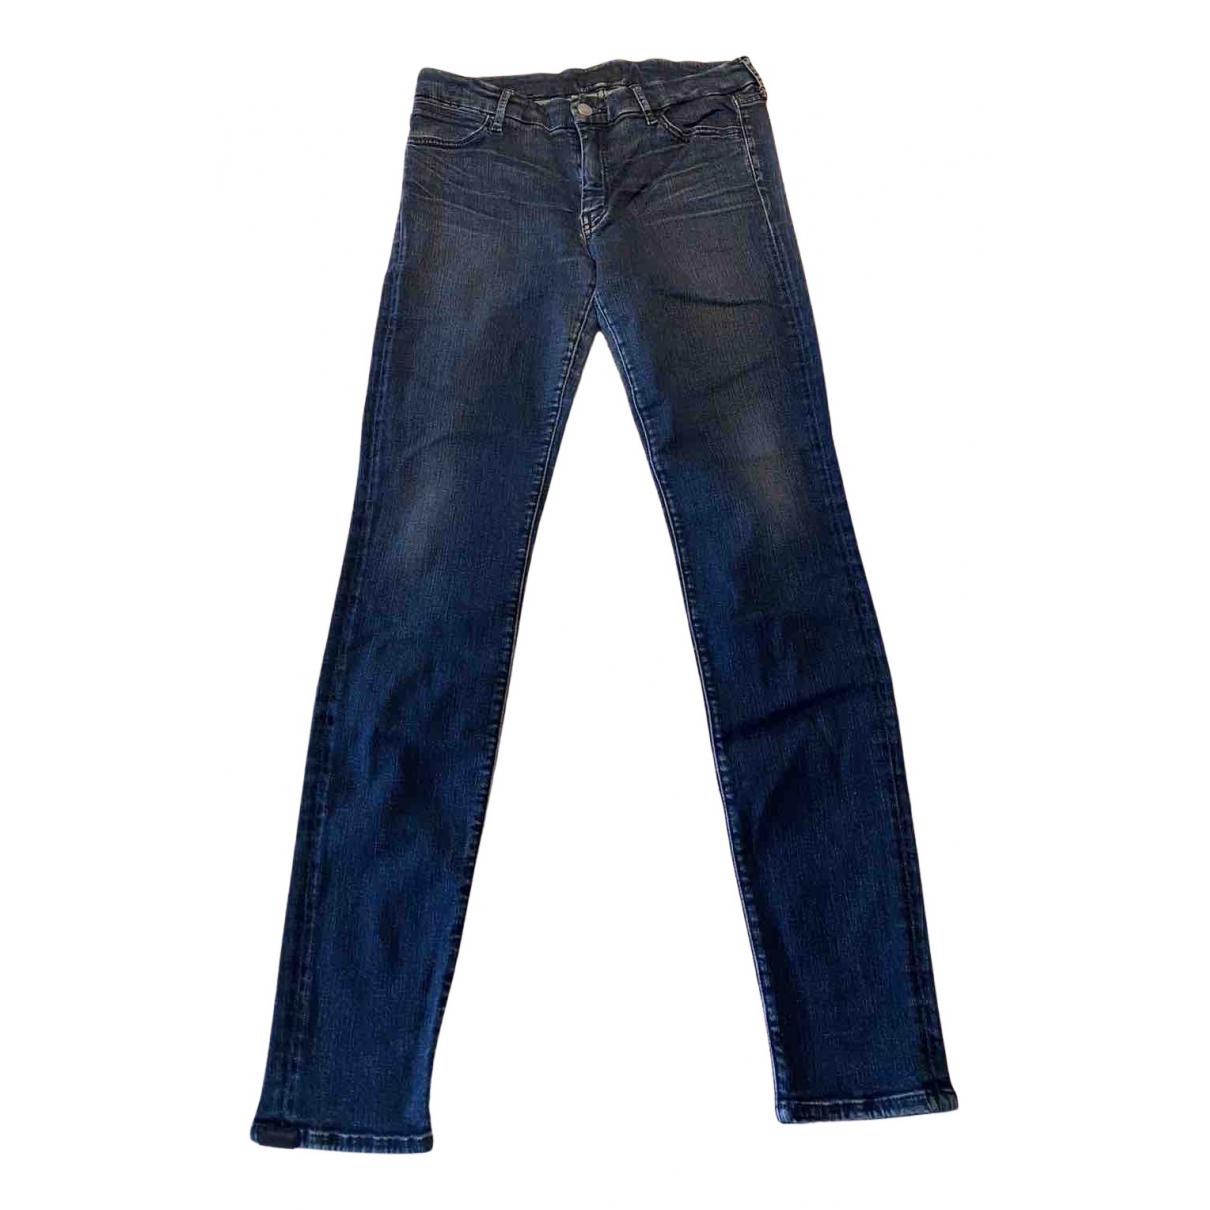 Koral N Blue Cotton - elasthane Jeans for Women 31 US